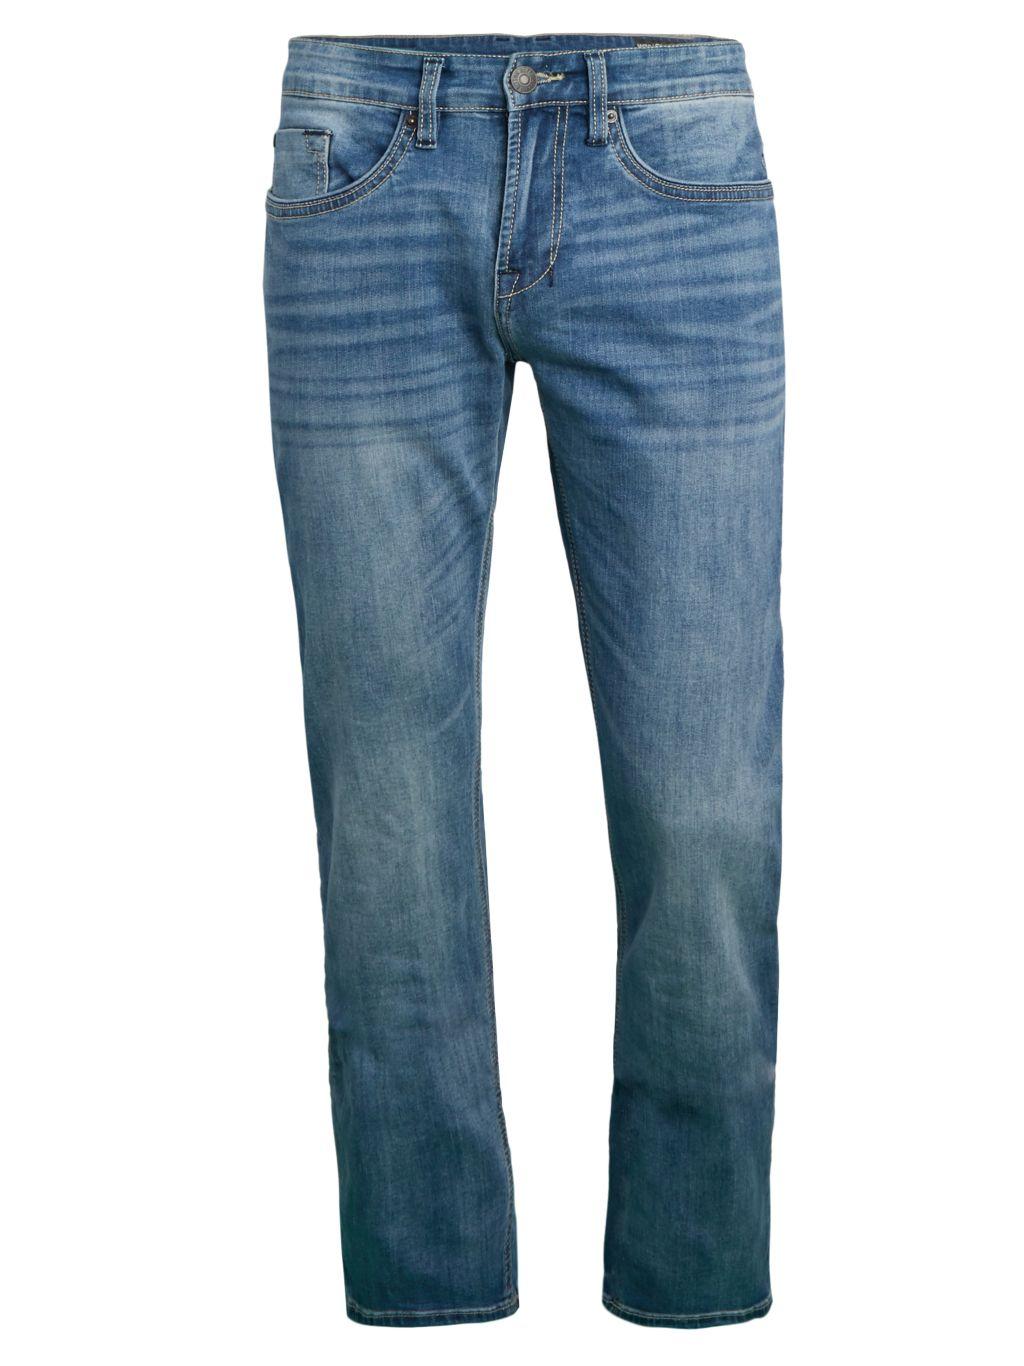 BUFFALO David Bitton Six-X Straight Stretch Jeans